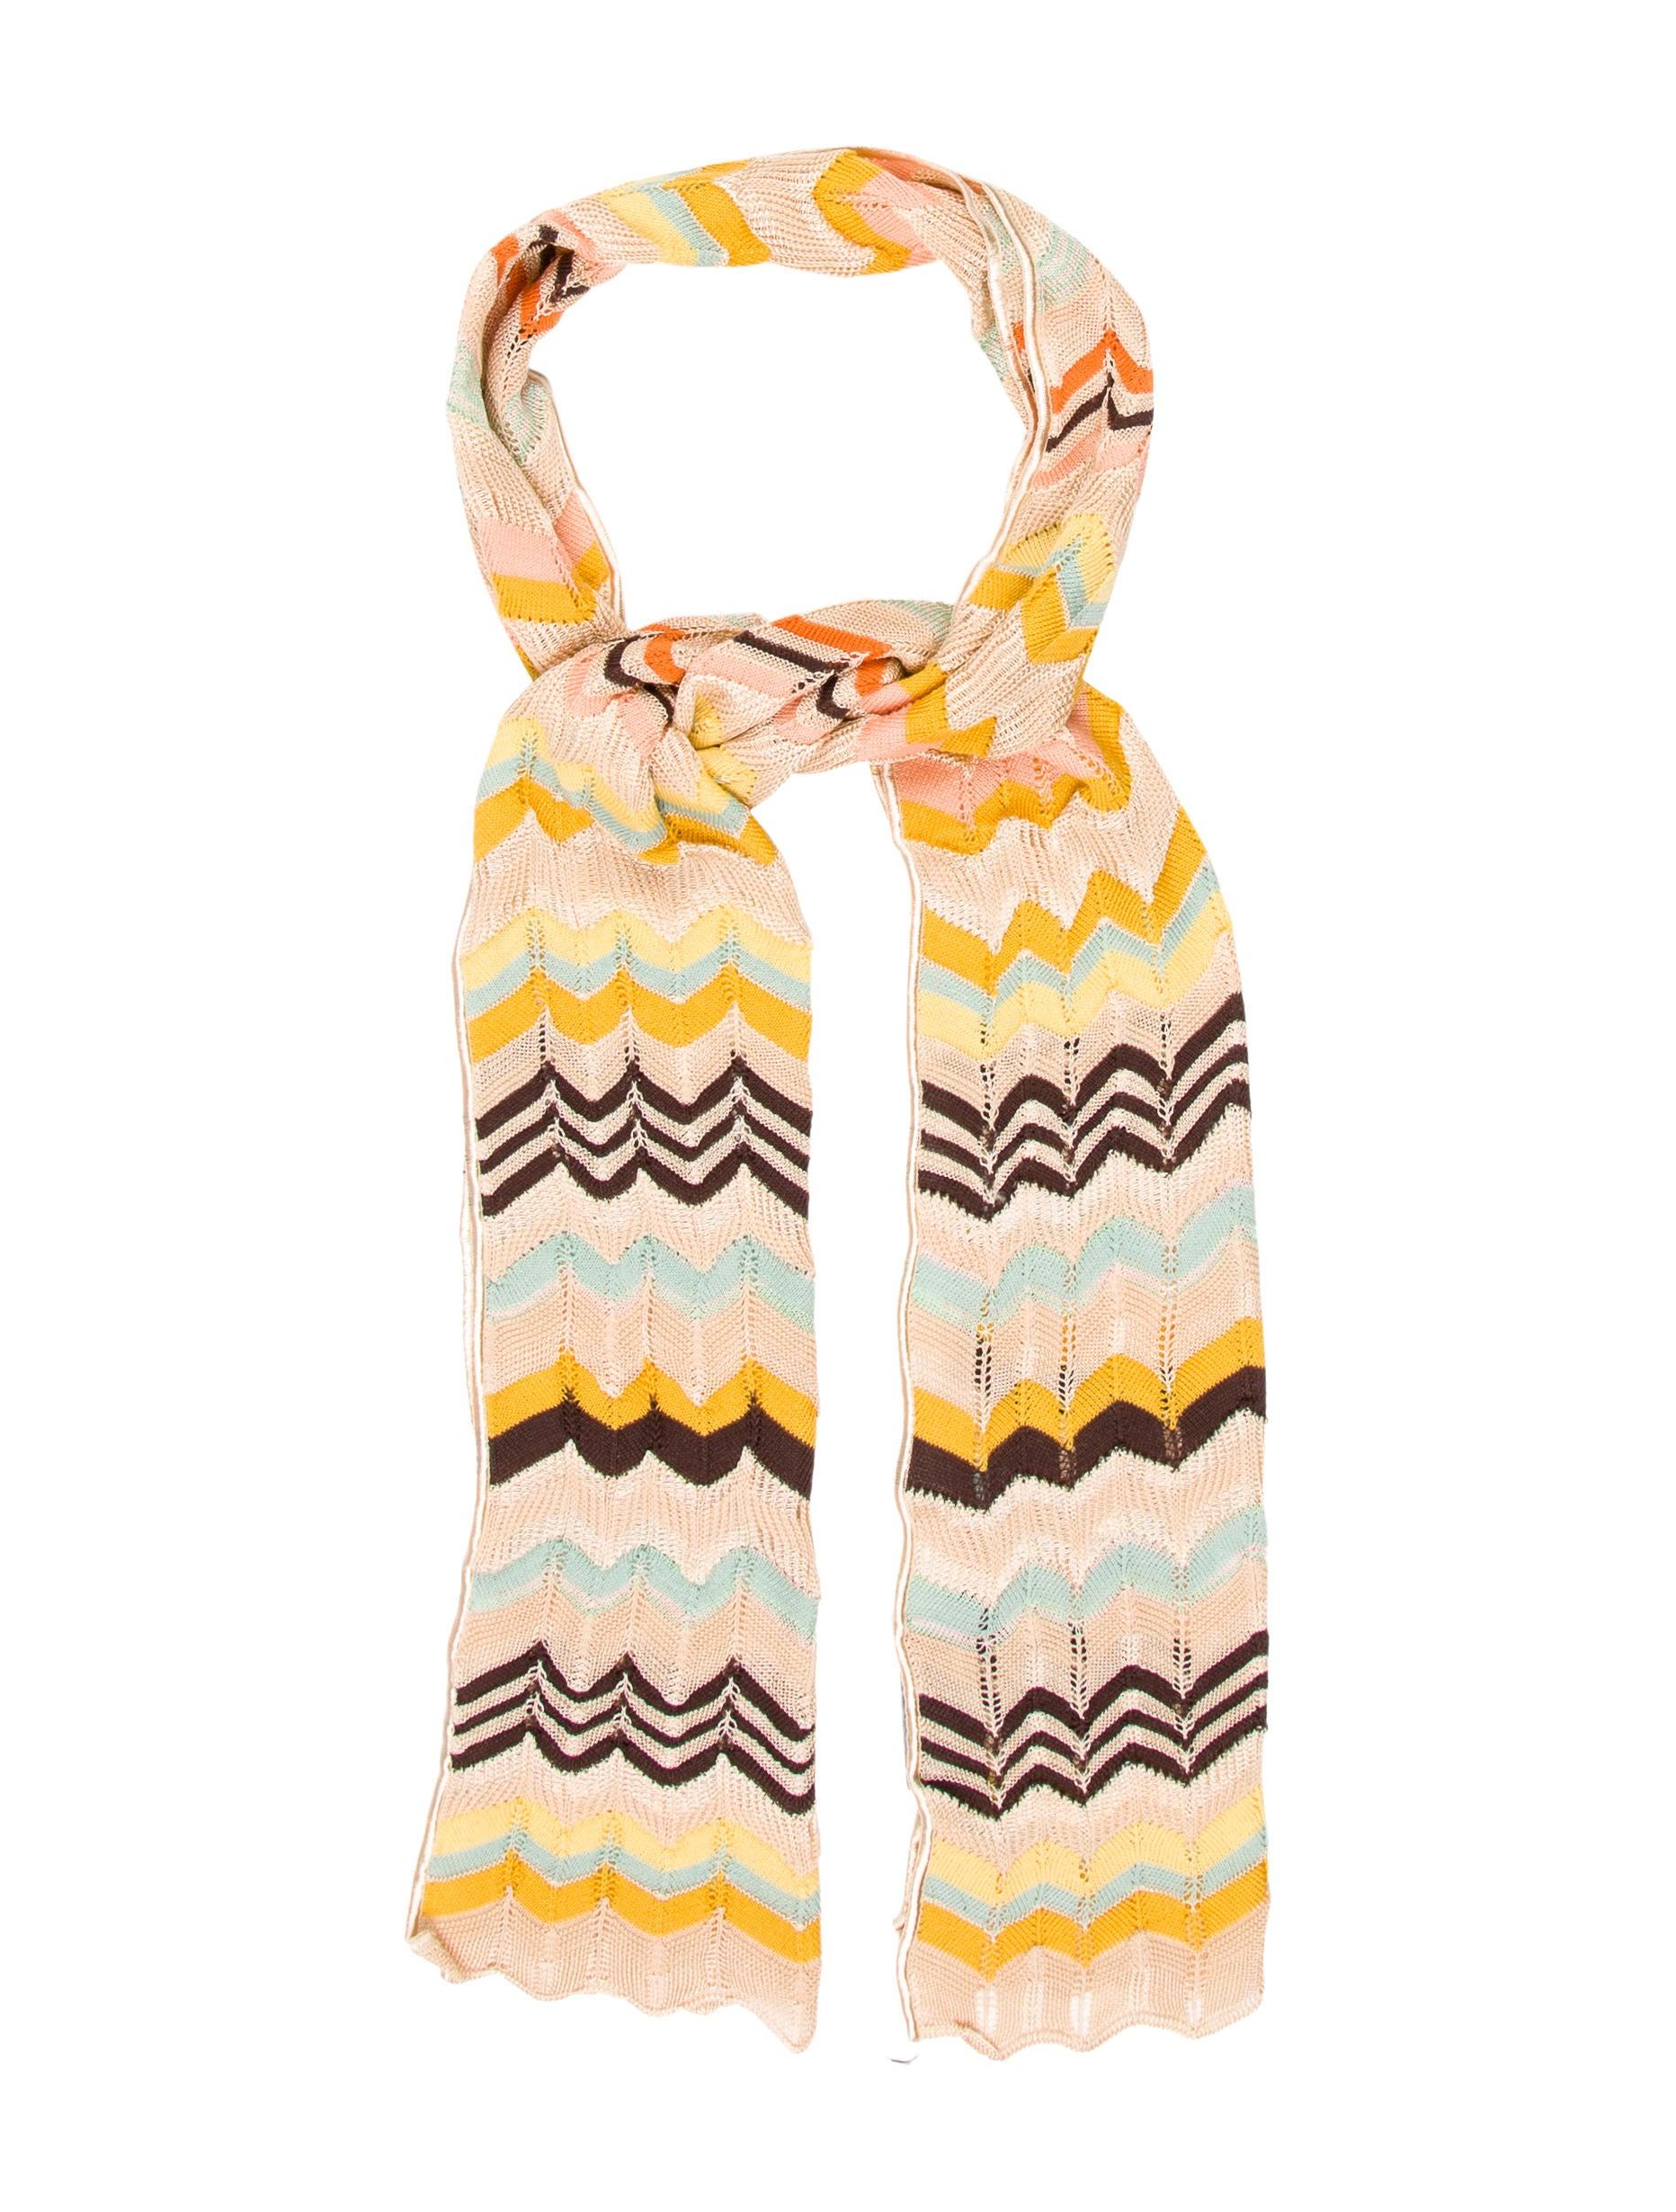 m missoni chevron pattern knit scarf accessories